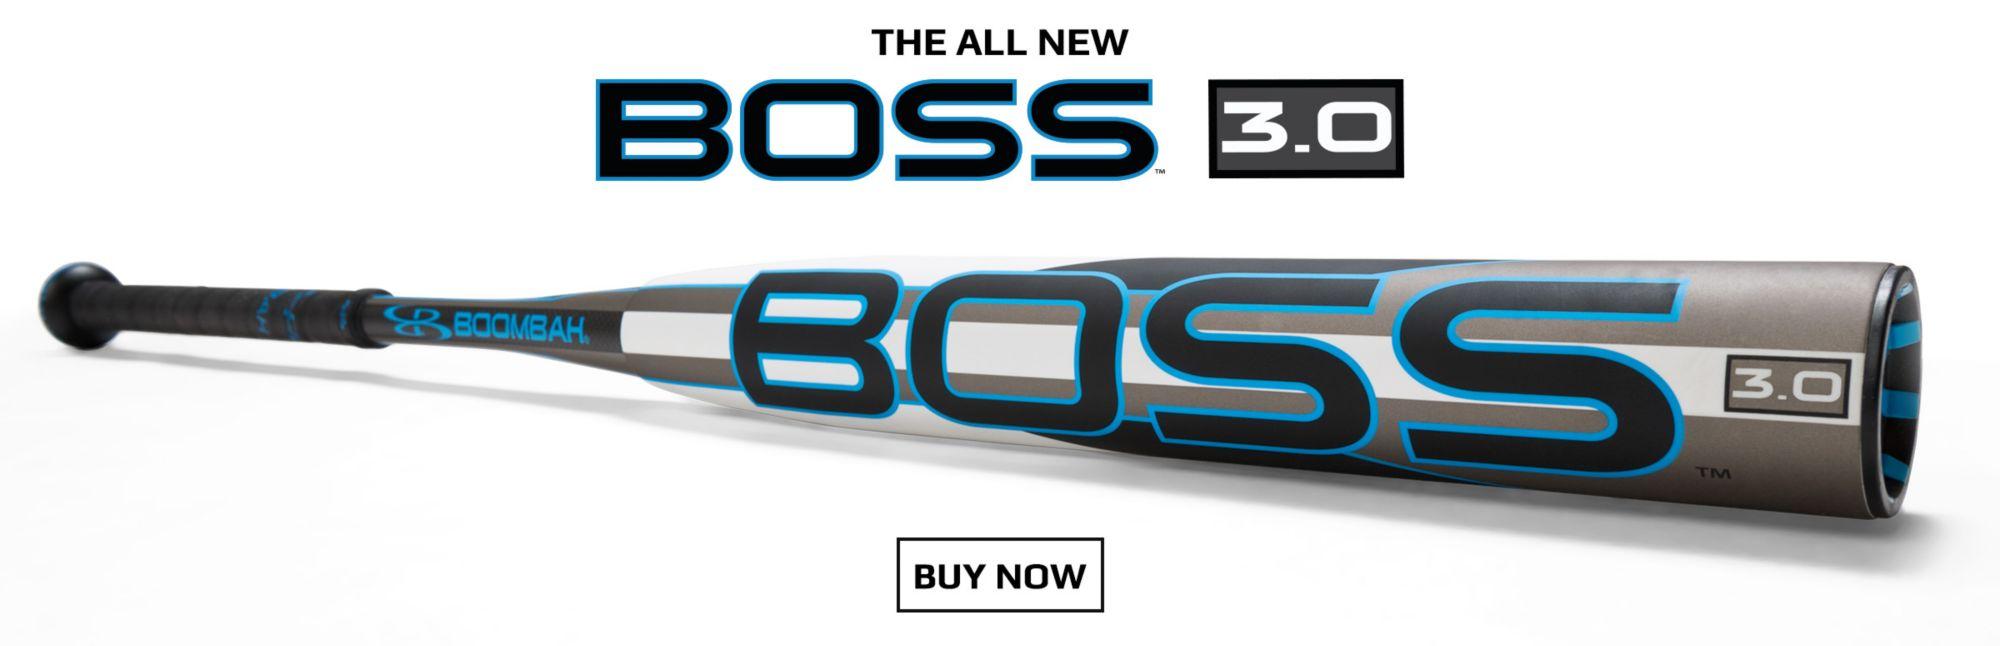 Boombah Boss 3.0 Slowpitch Bat